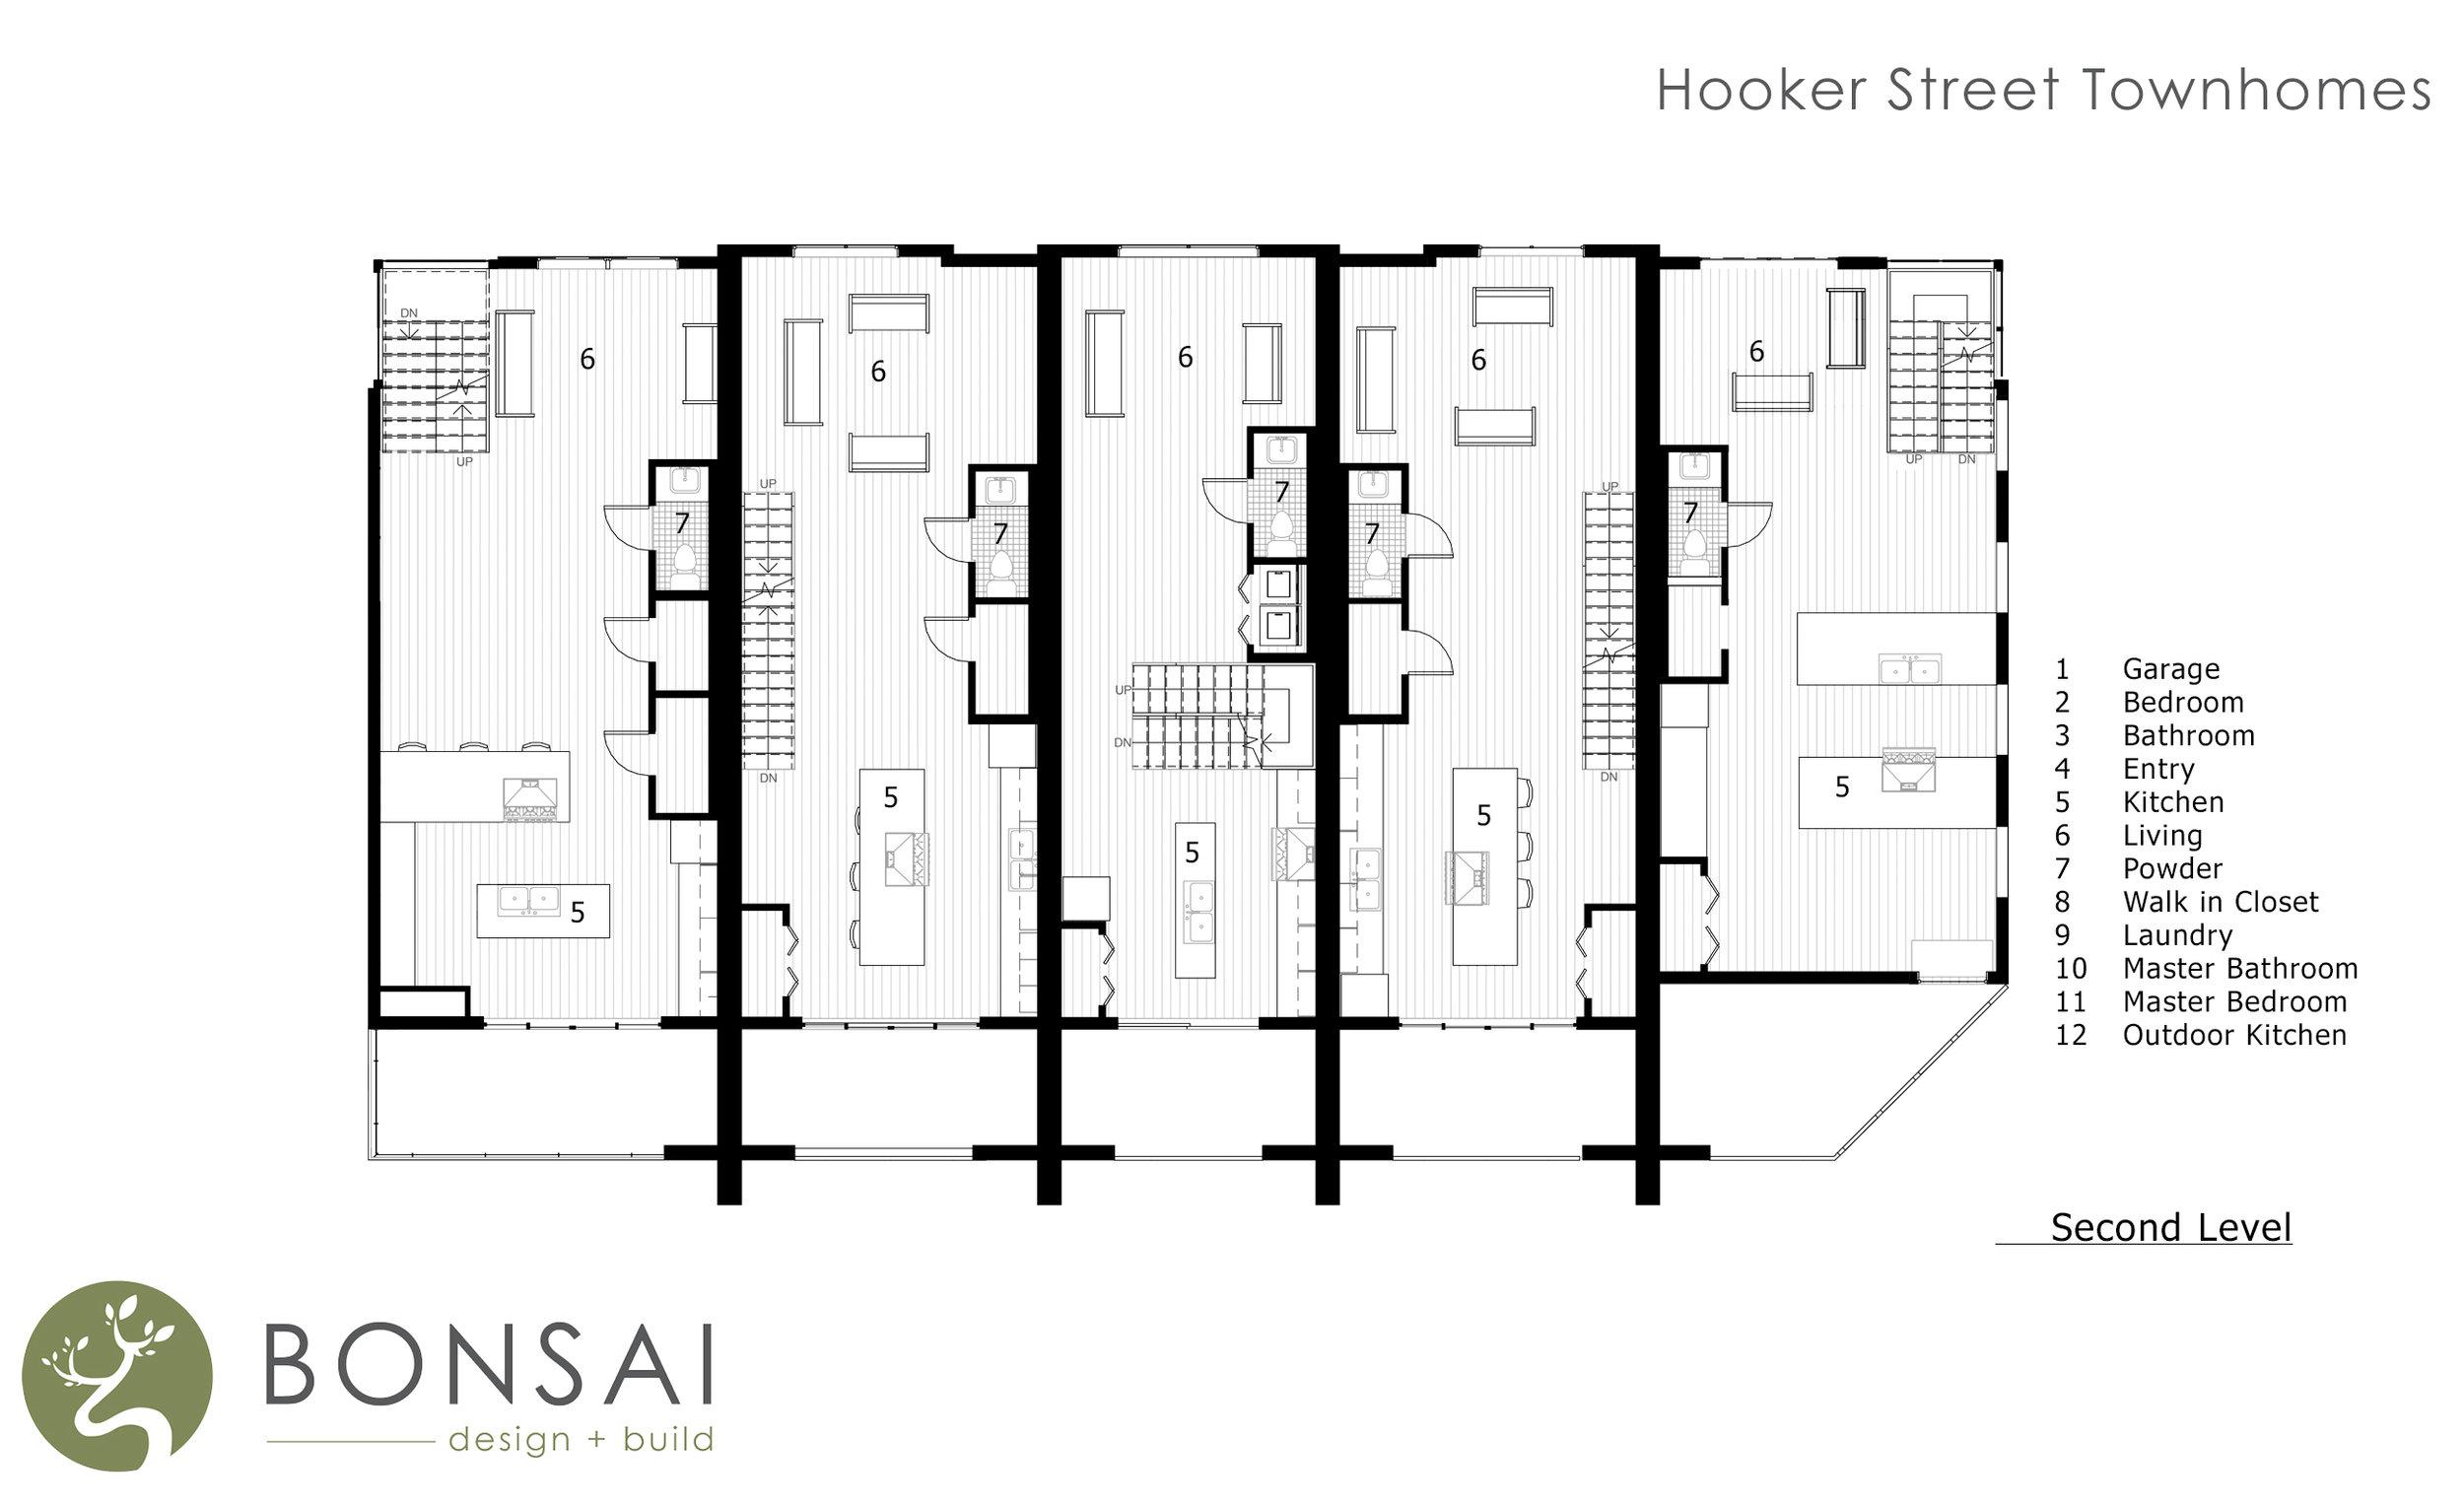 Hooker St Townhomes Second Level Plan.jpg